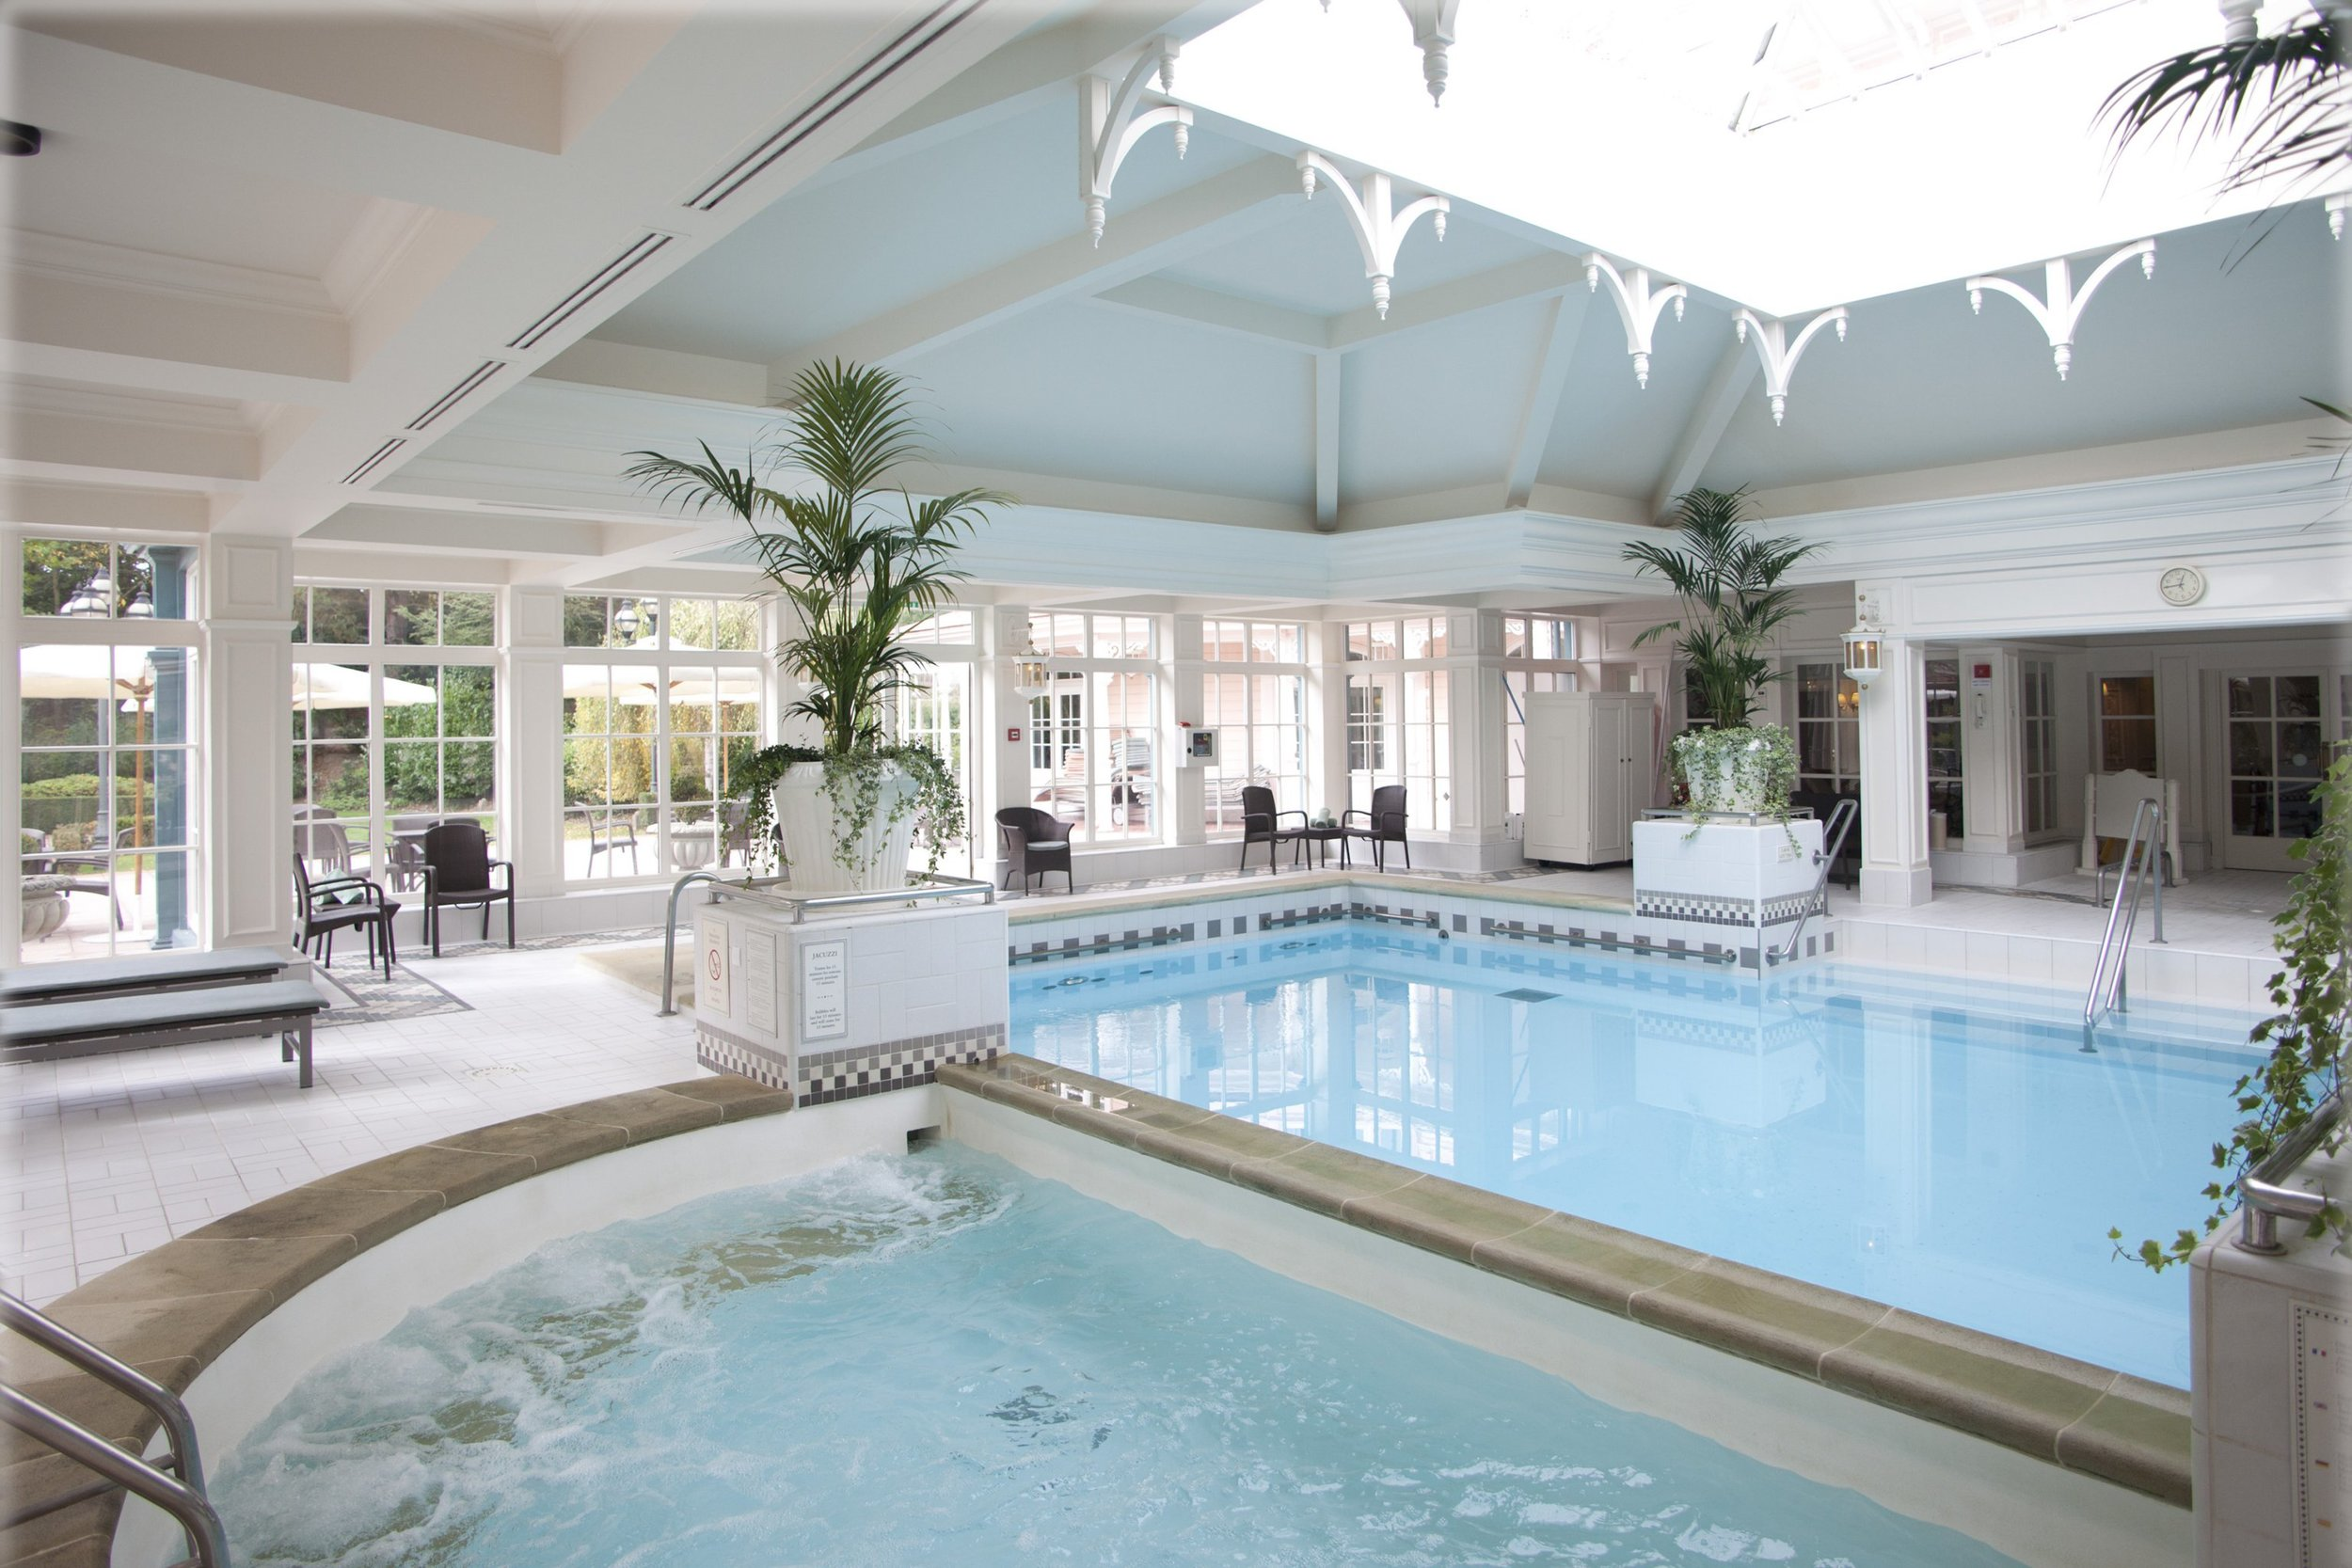 Cheyenne Hotel Disneyland Paris Swimming Pool Sport Inpiration Gallery